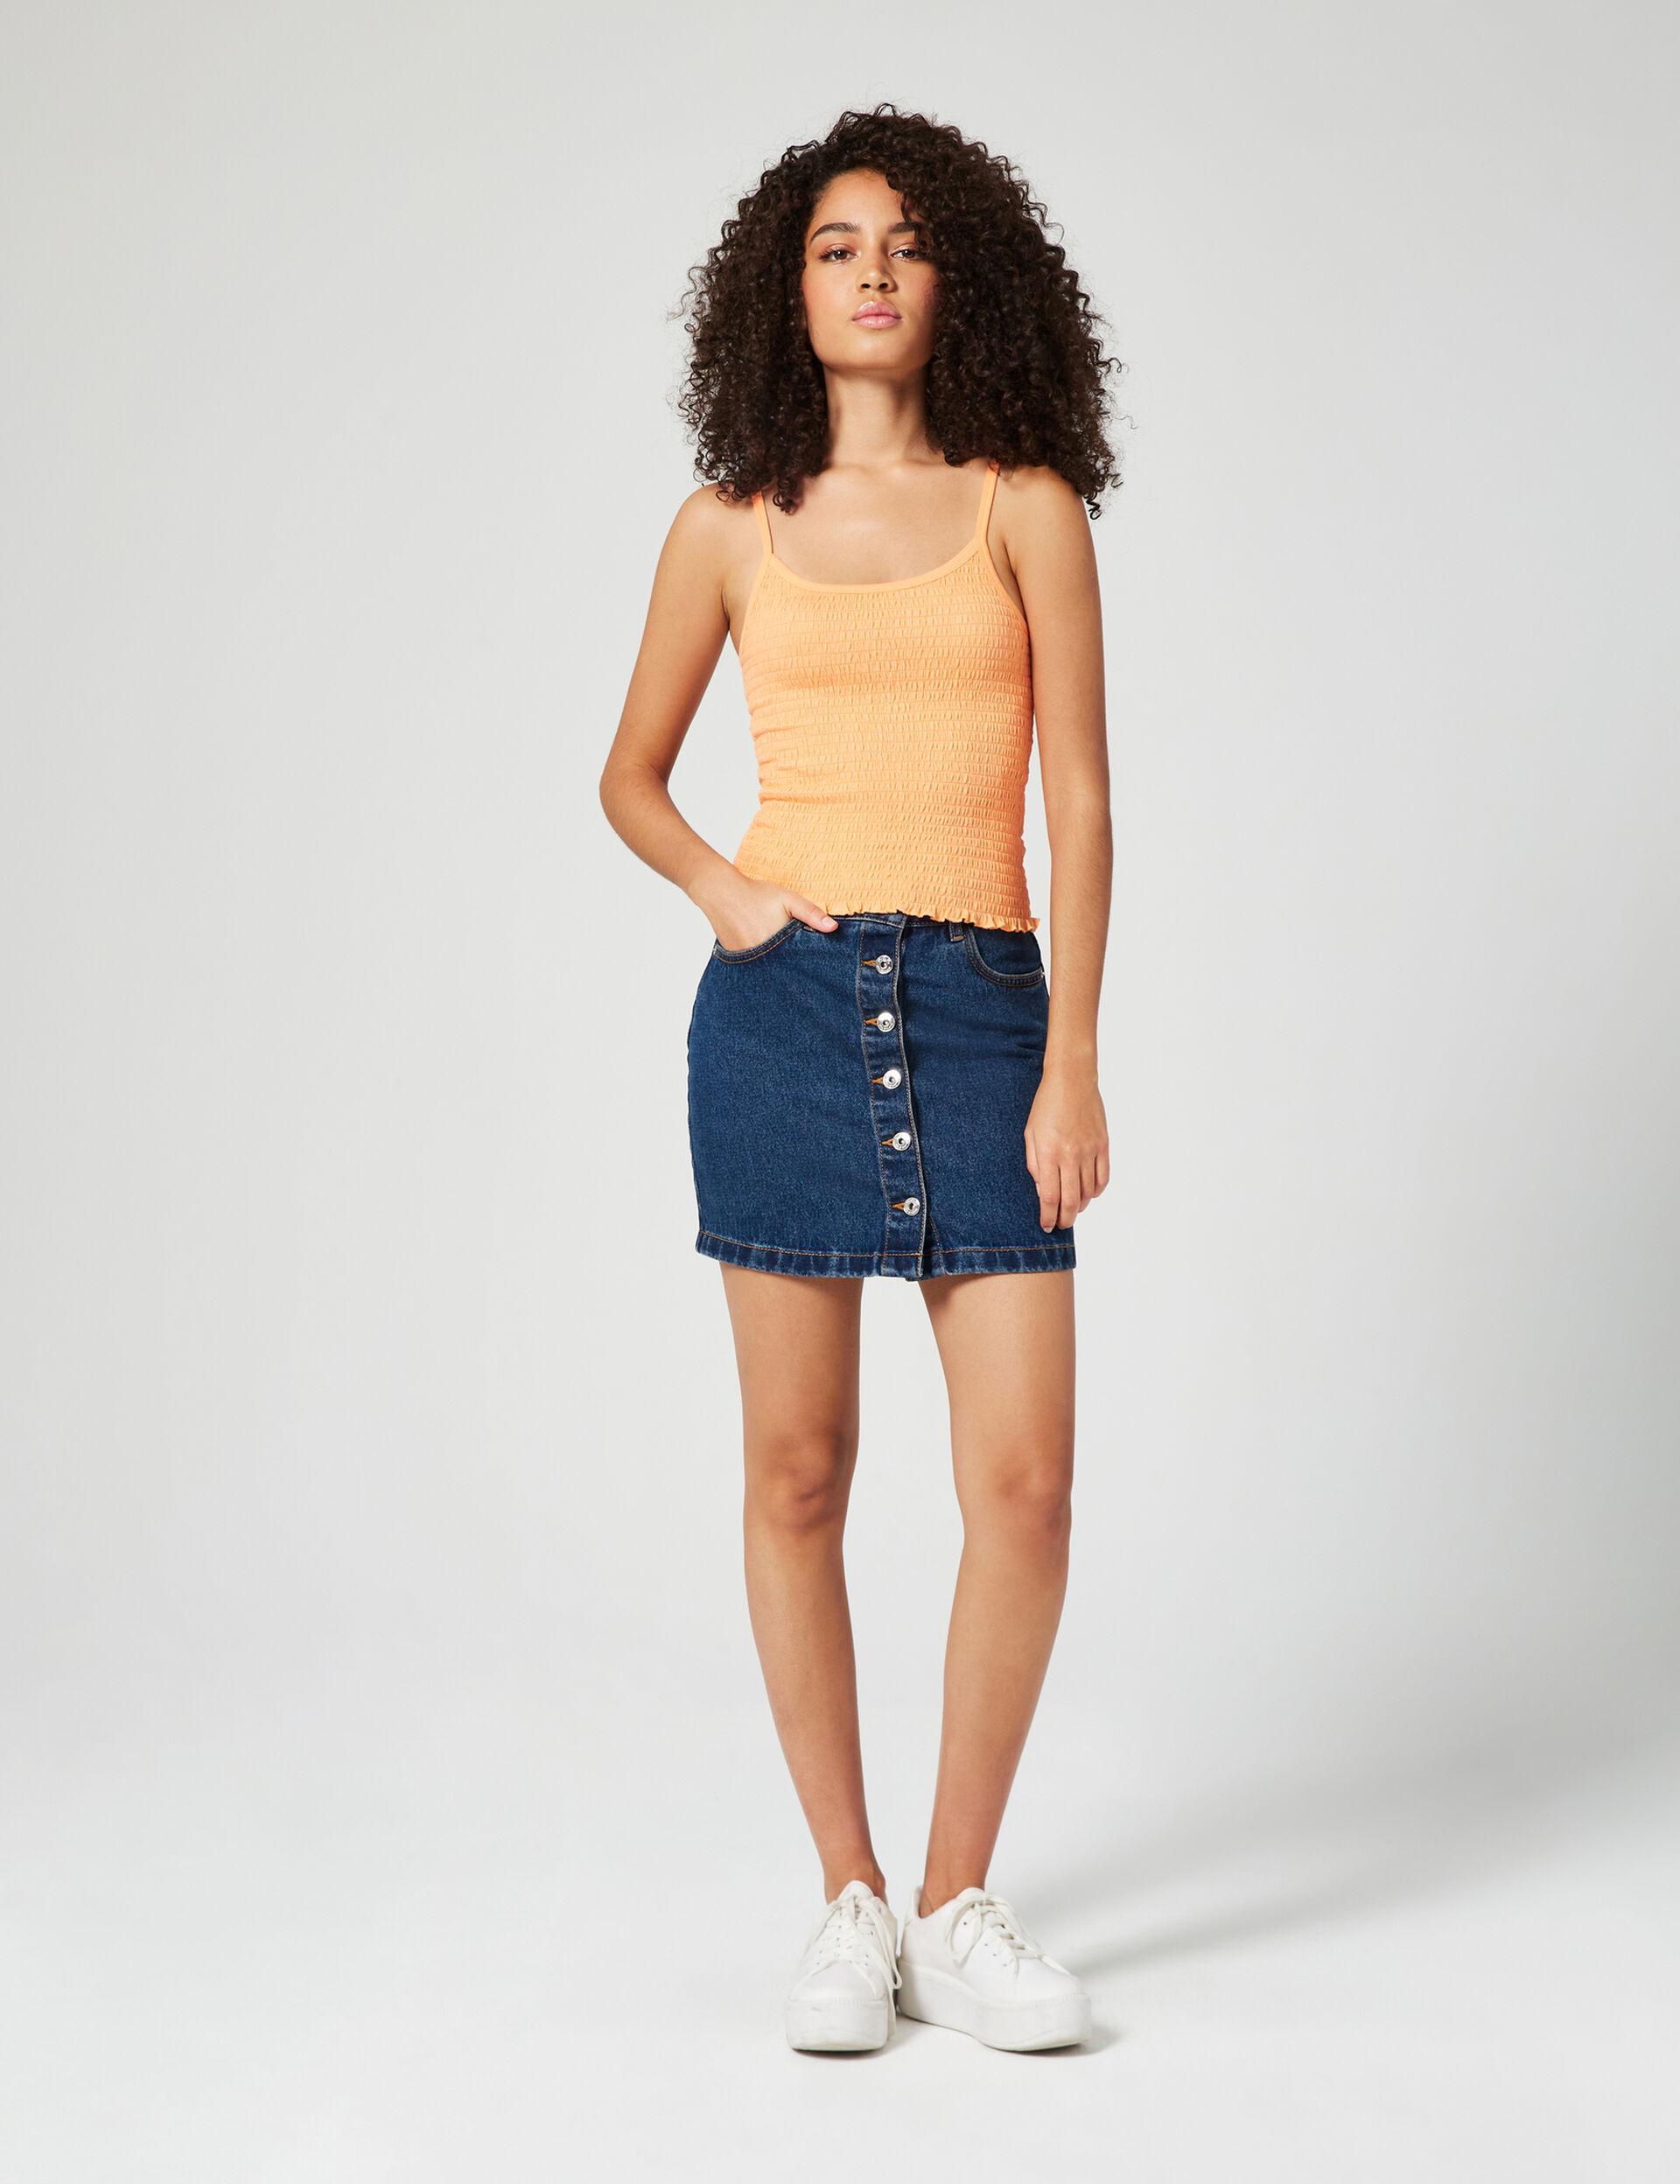 Jupe en jean boutonnée